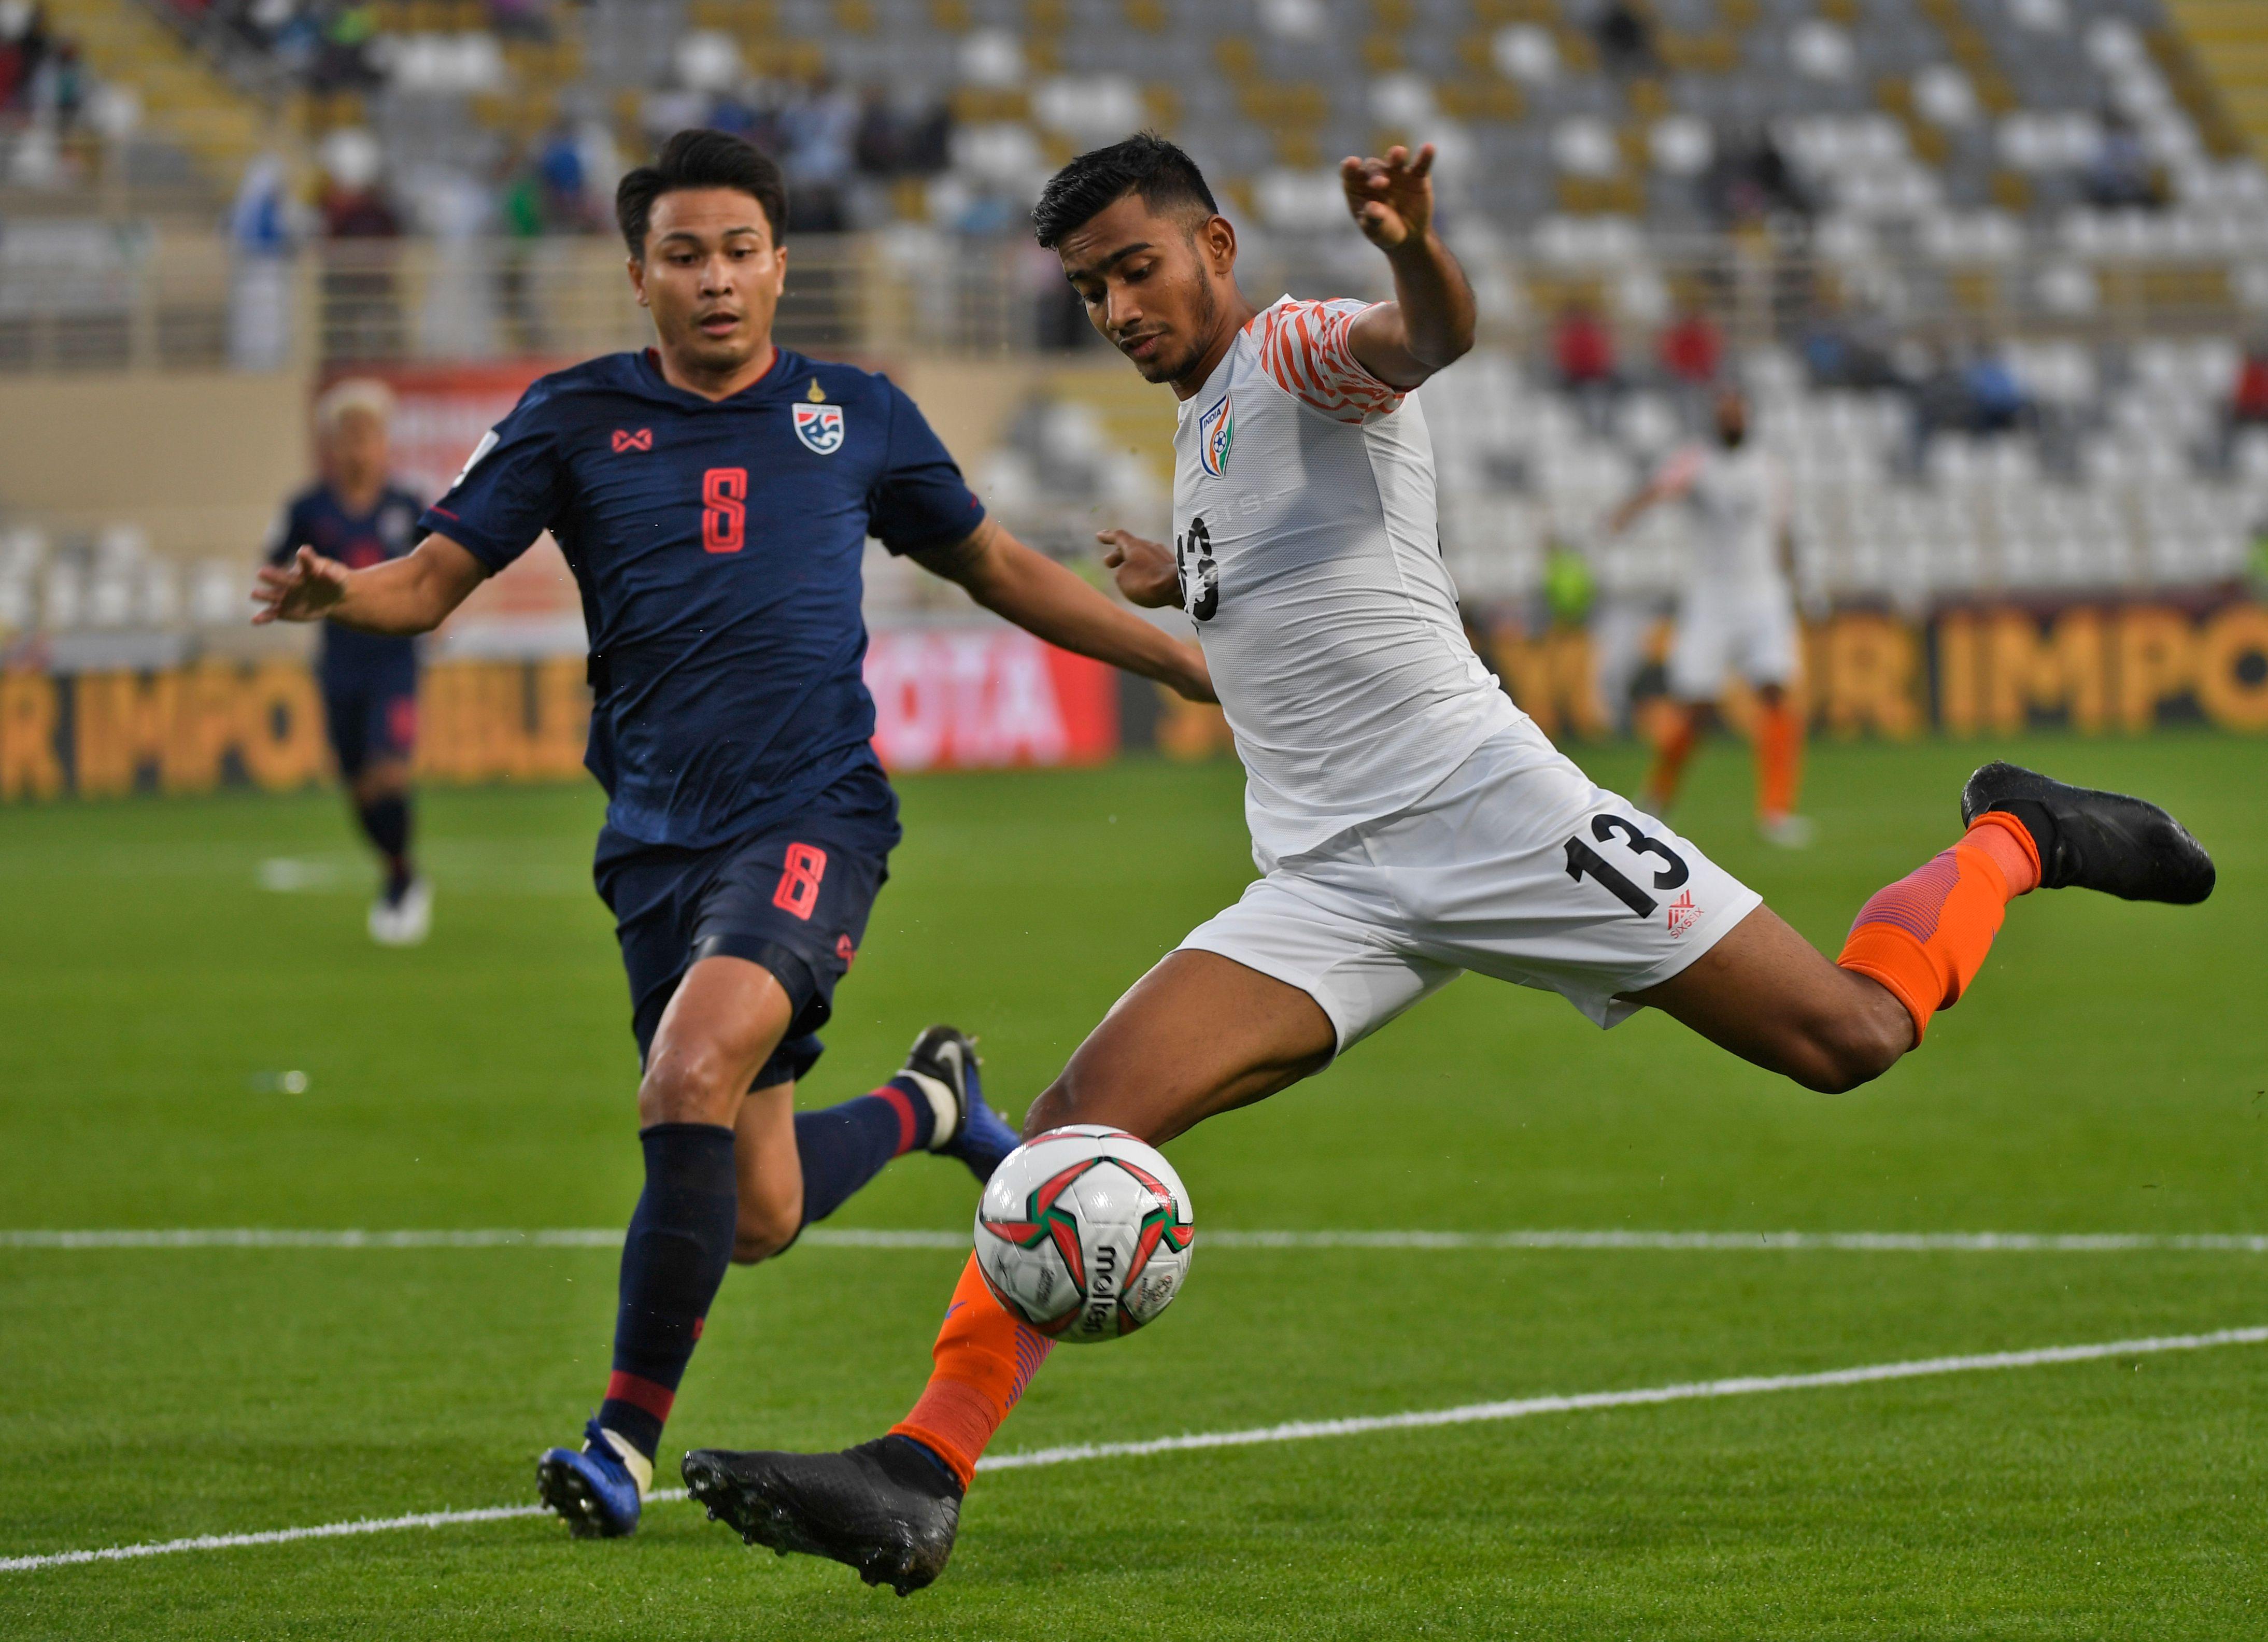 India vs Thailand Ashique Kuruniyan